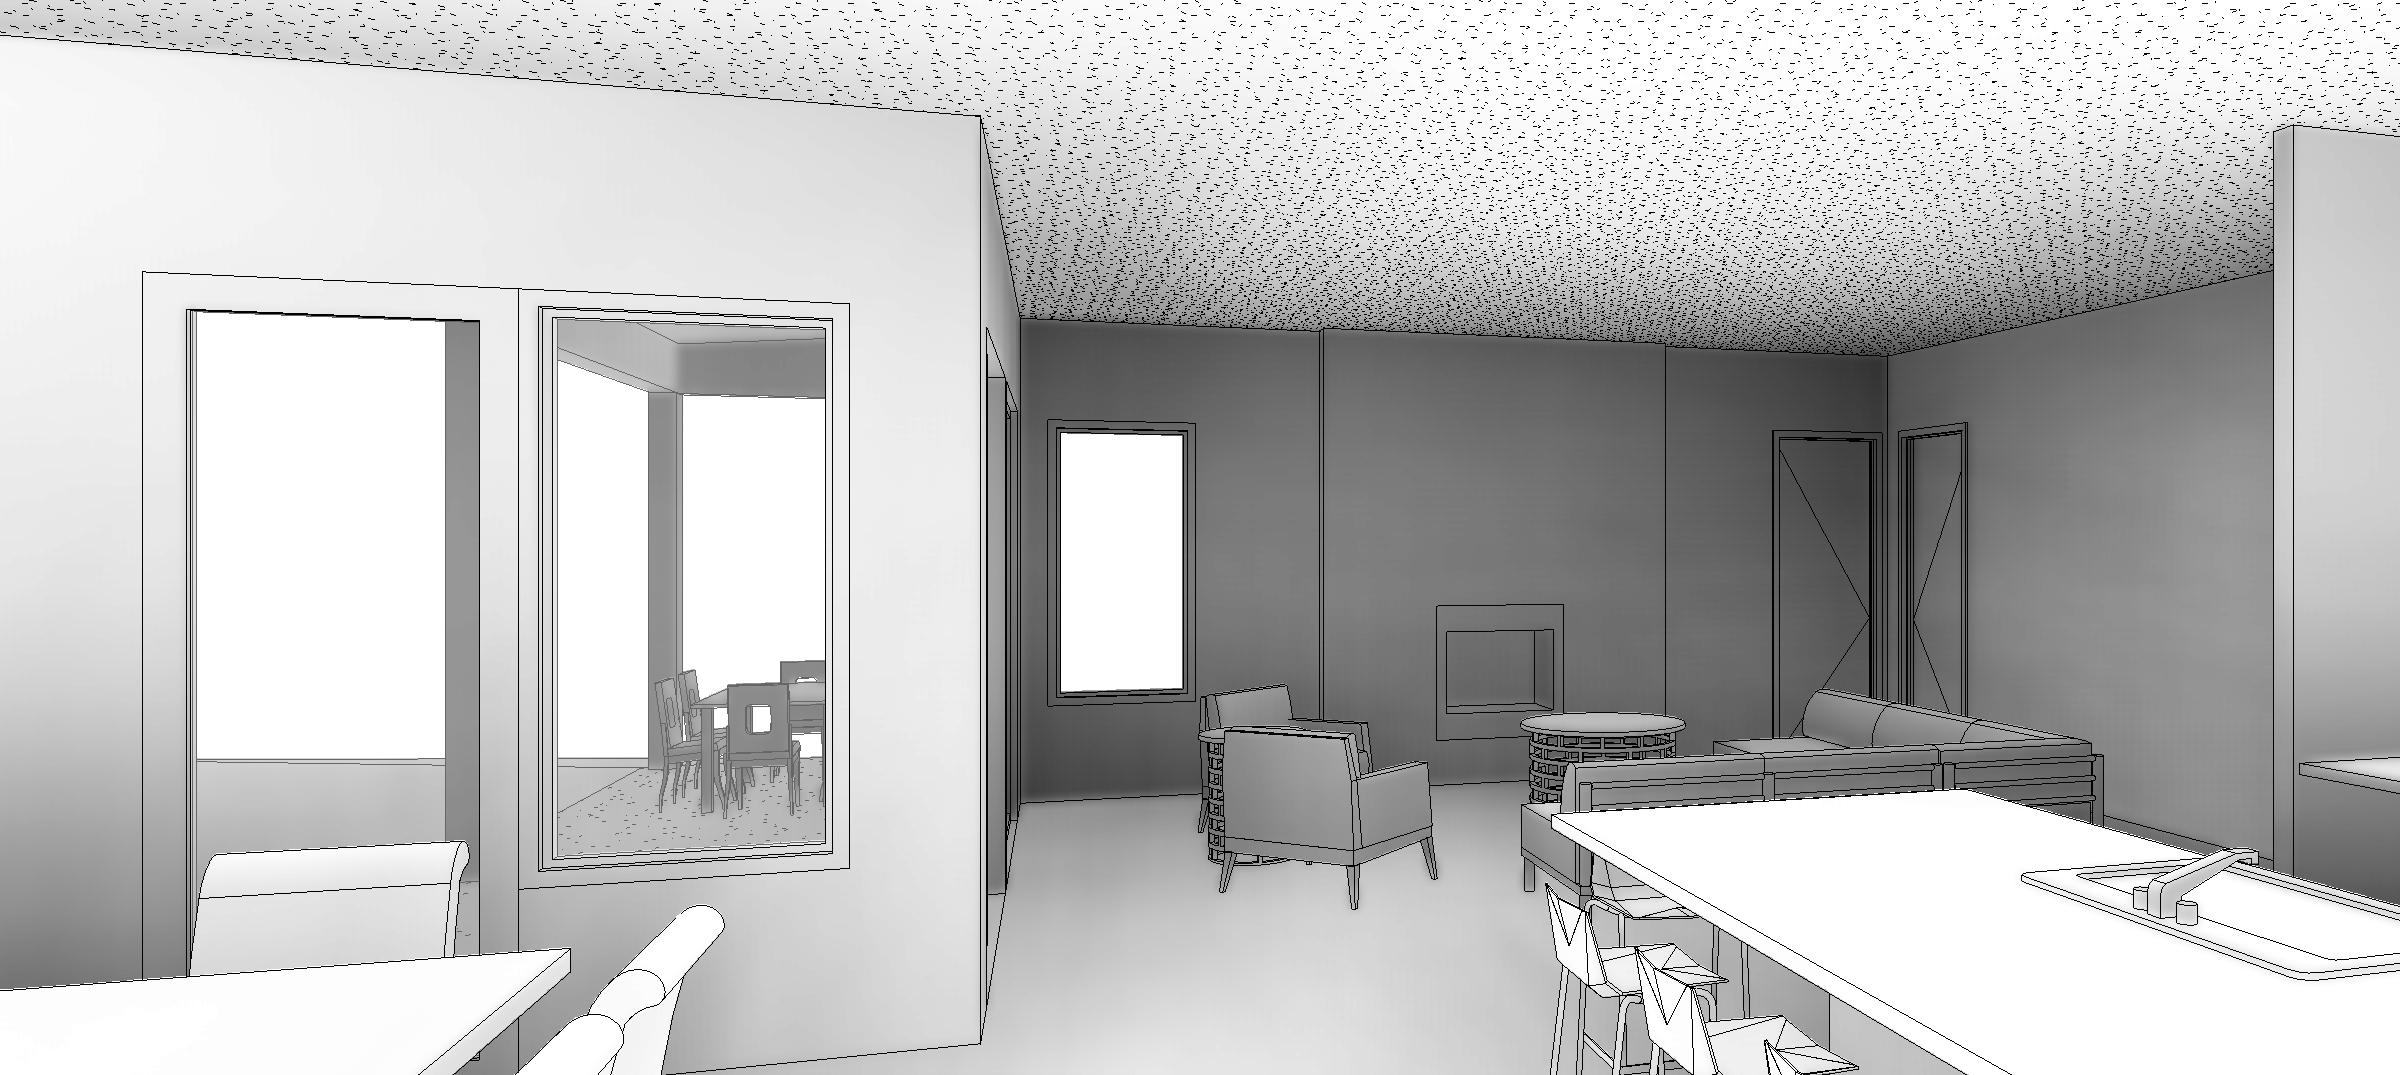 Hyde Residence CD - 3D View - DINING ROOM.jpg